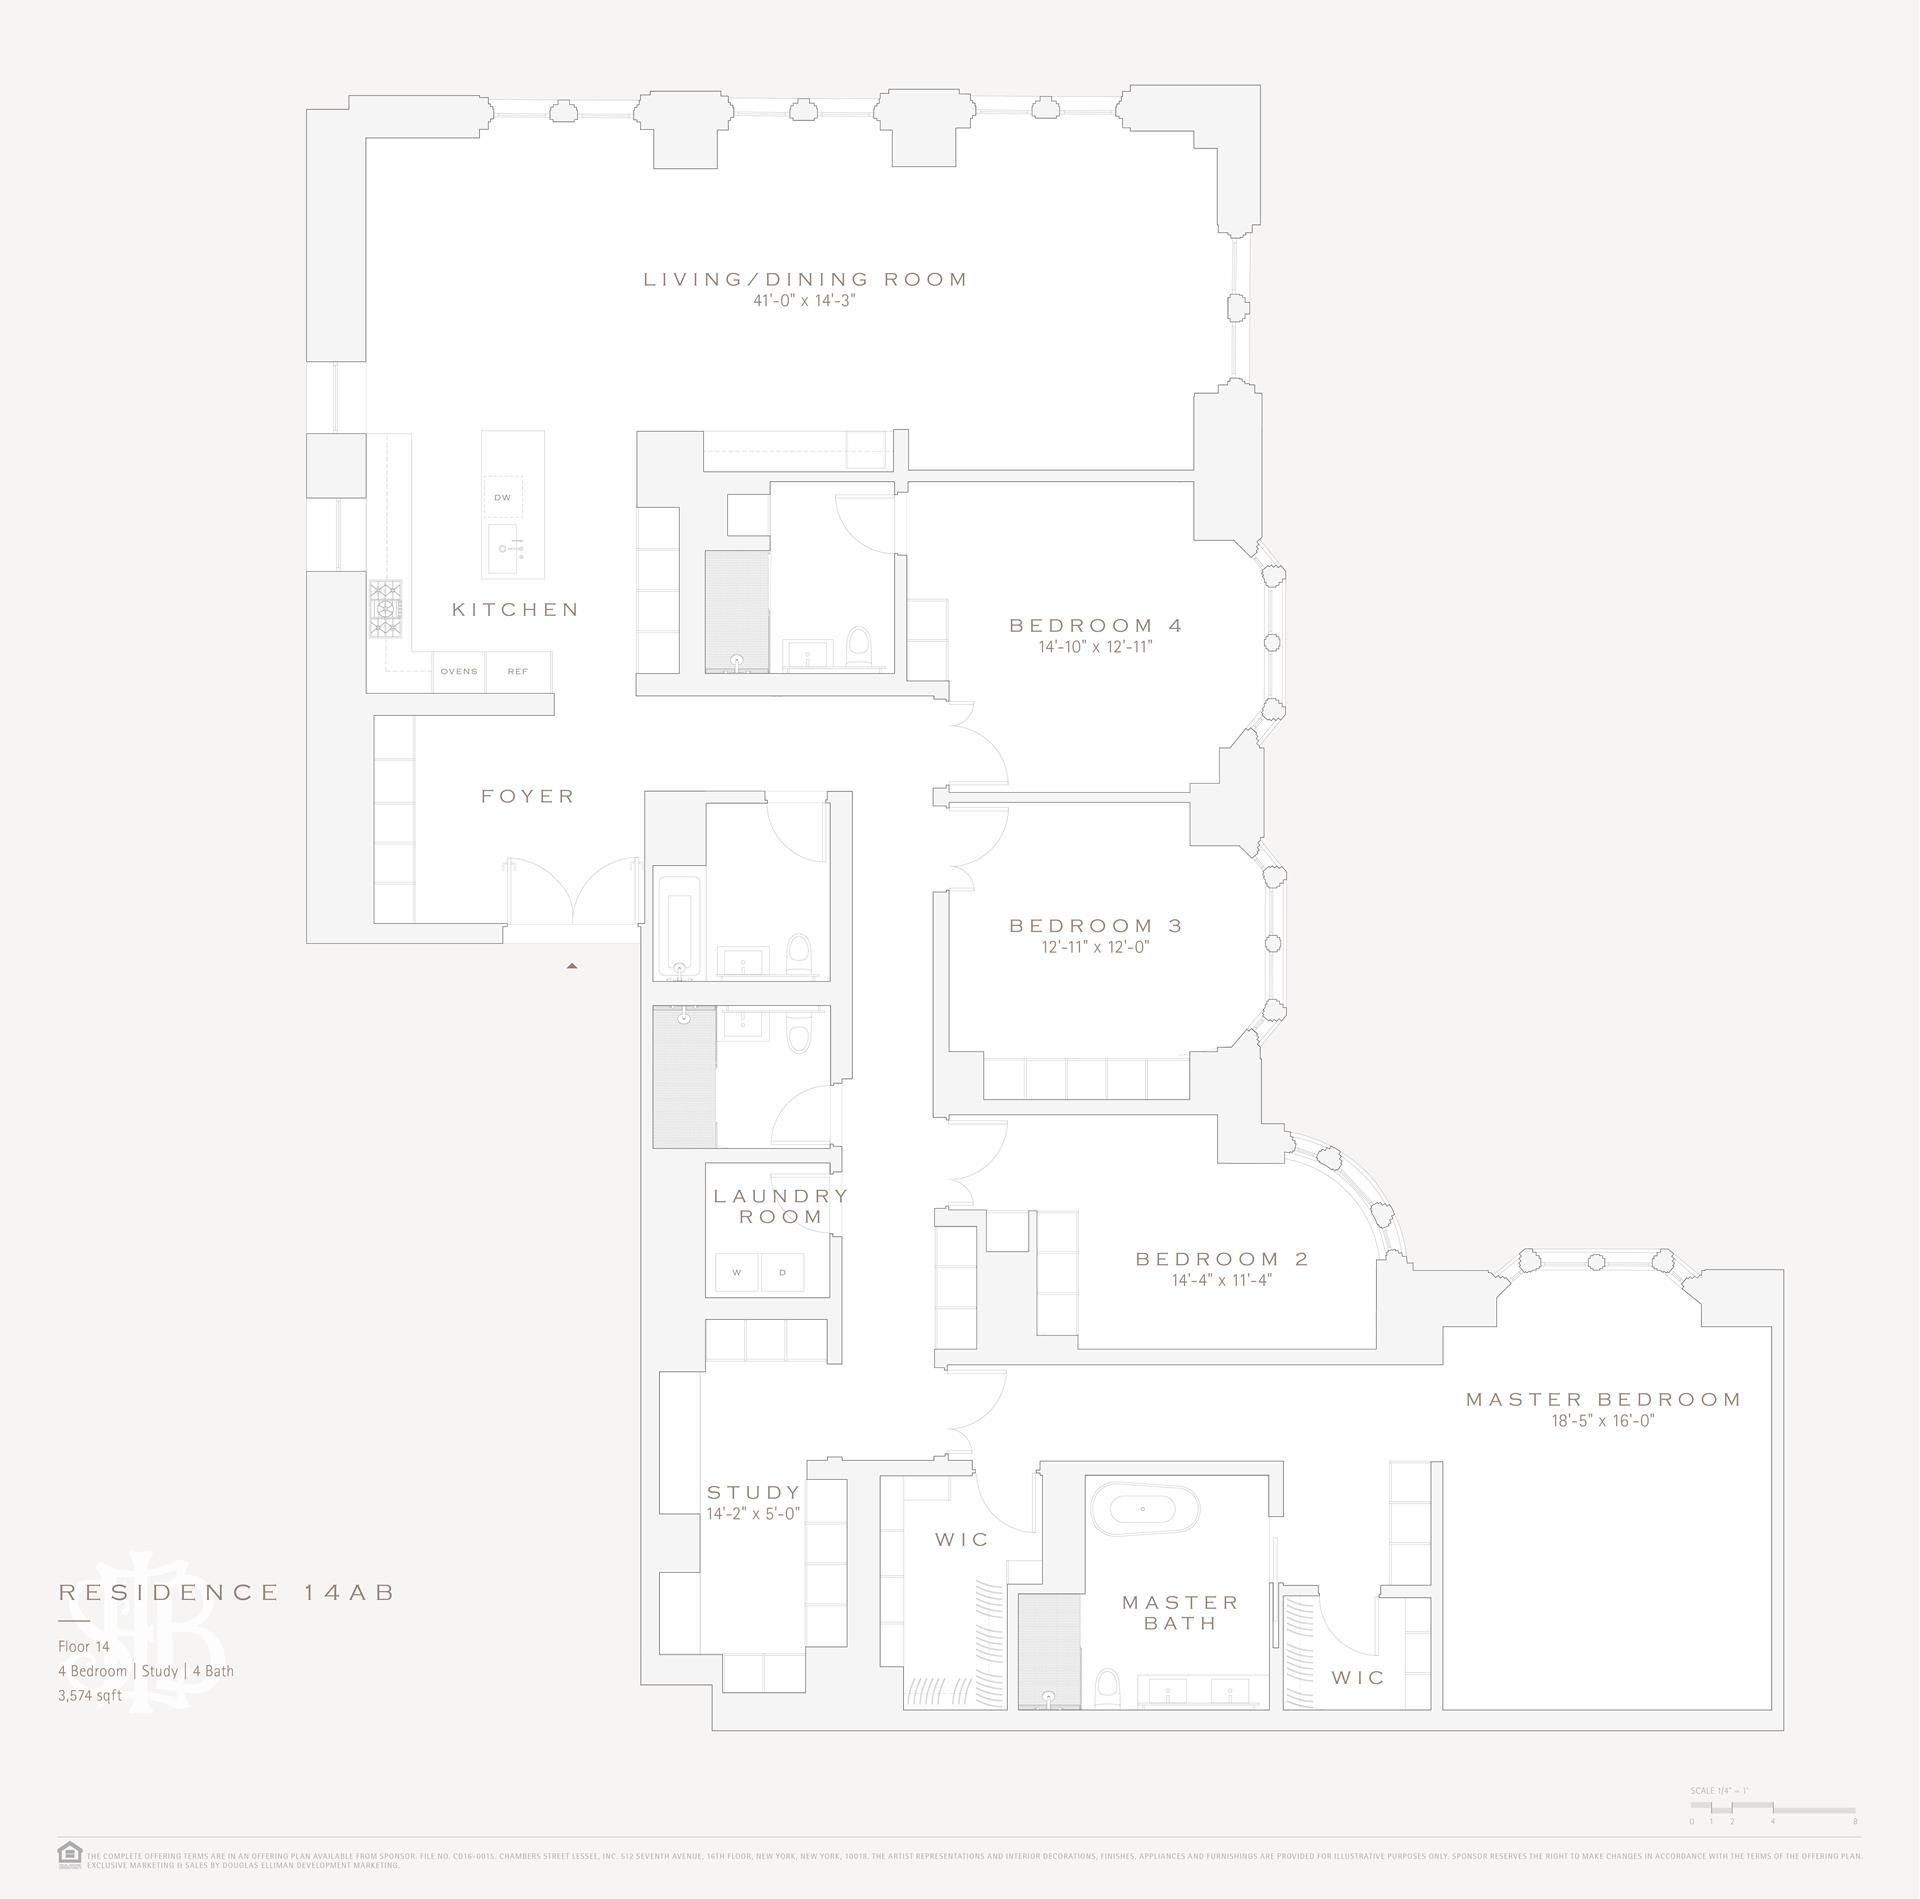 Floor plan of 49 Chambers St, 14AB - TriBeCa, New York